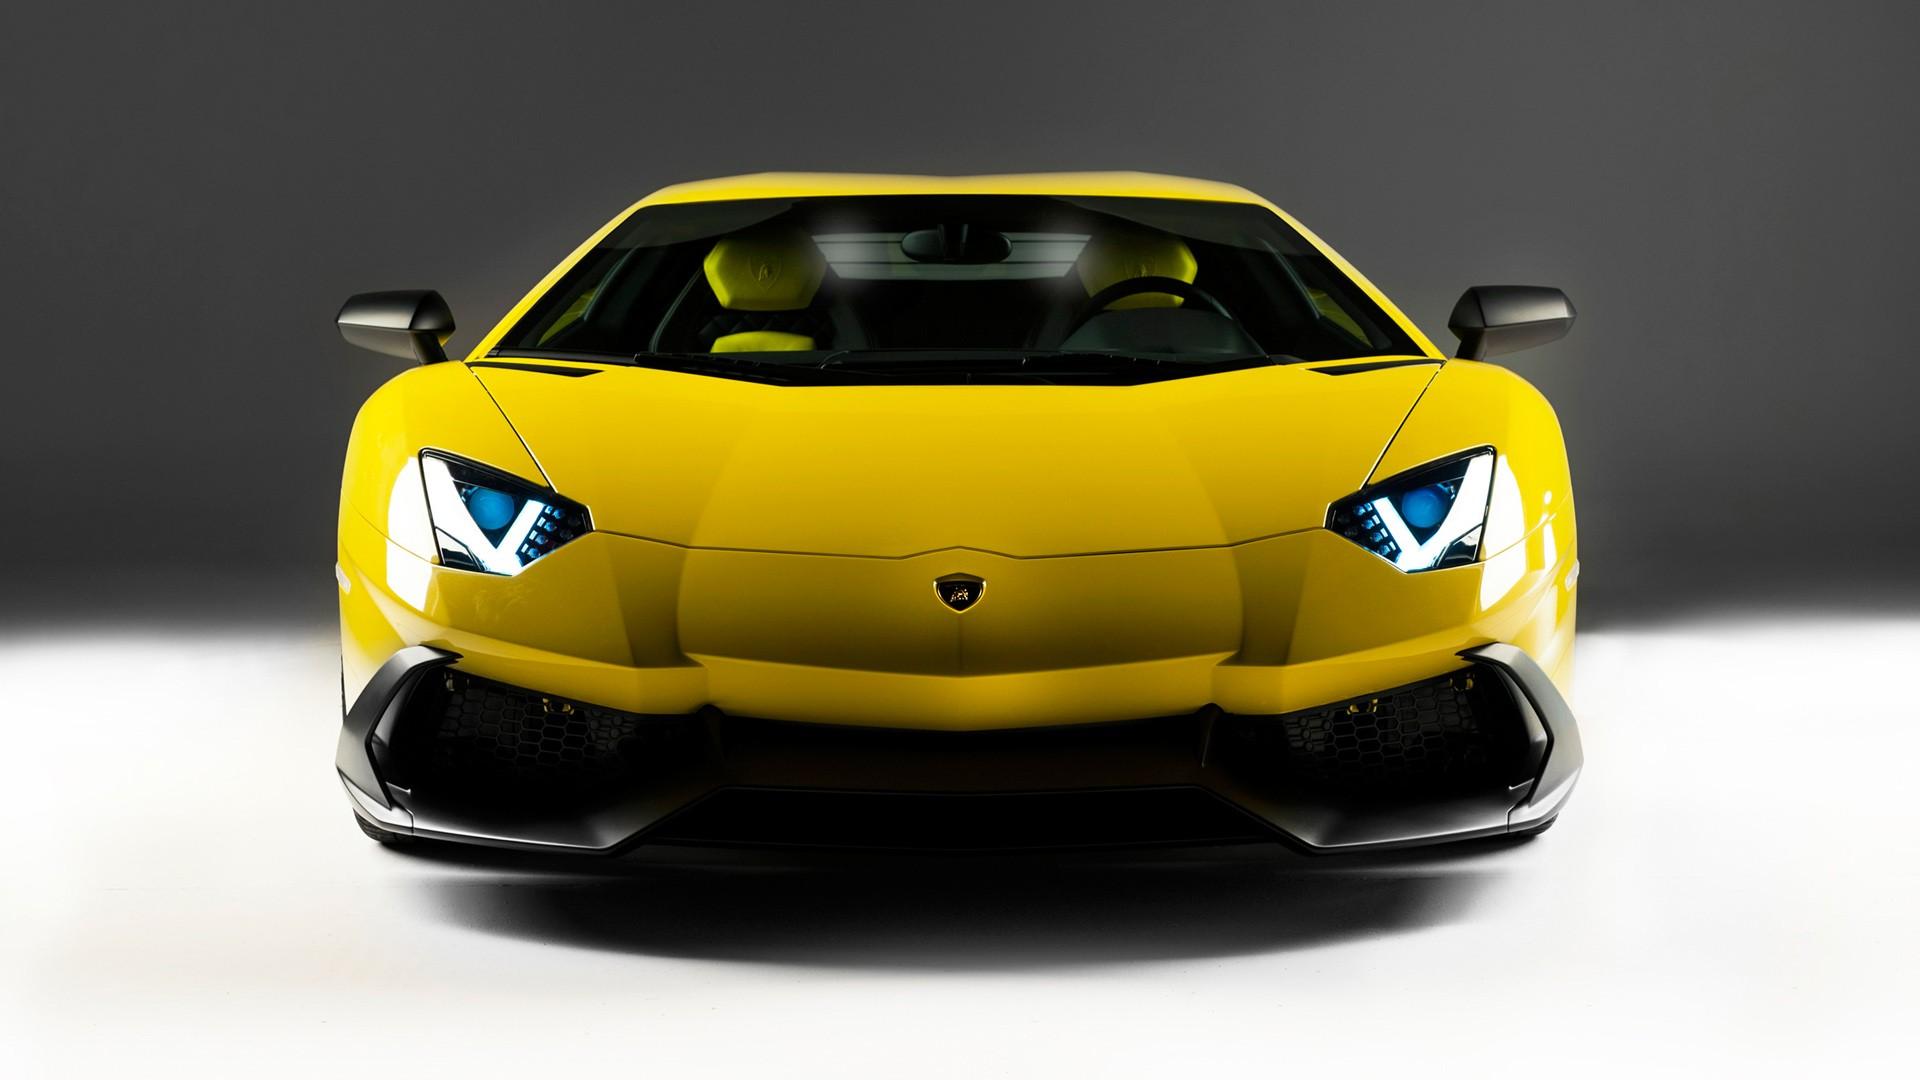 Lamborghini Aventador LP720 4 50 Anniversario Edition ...